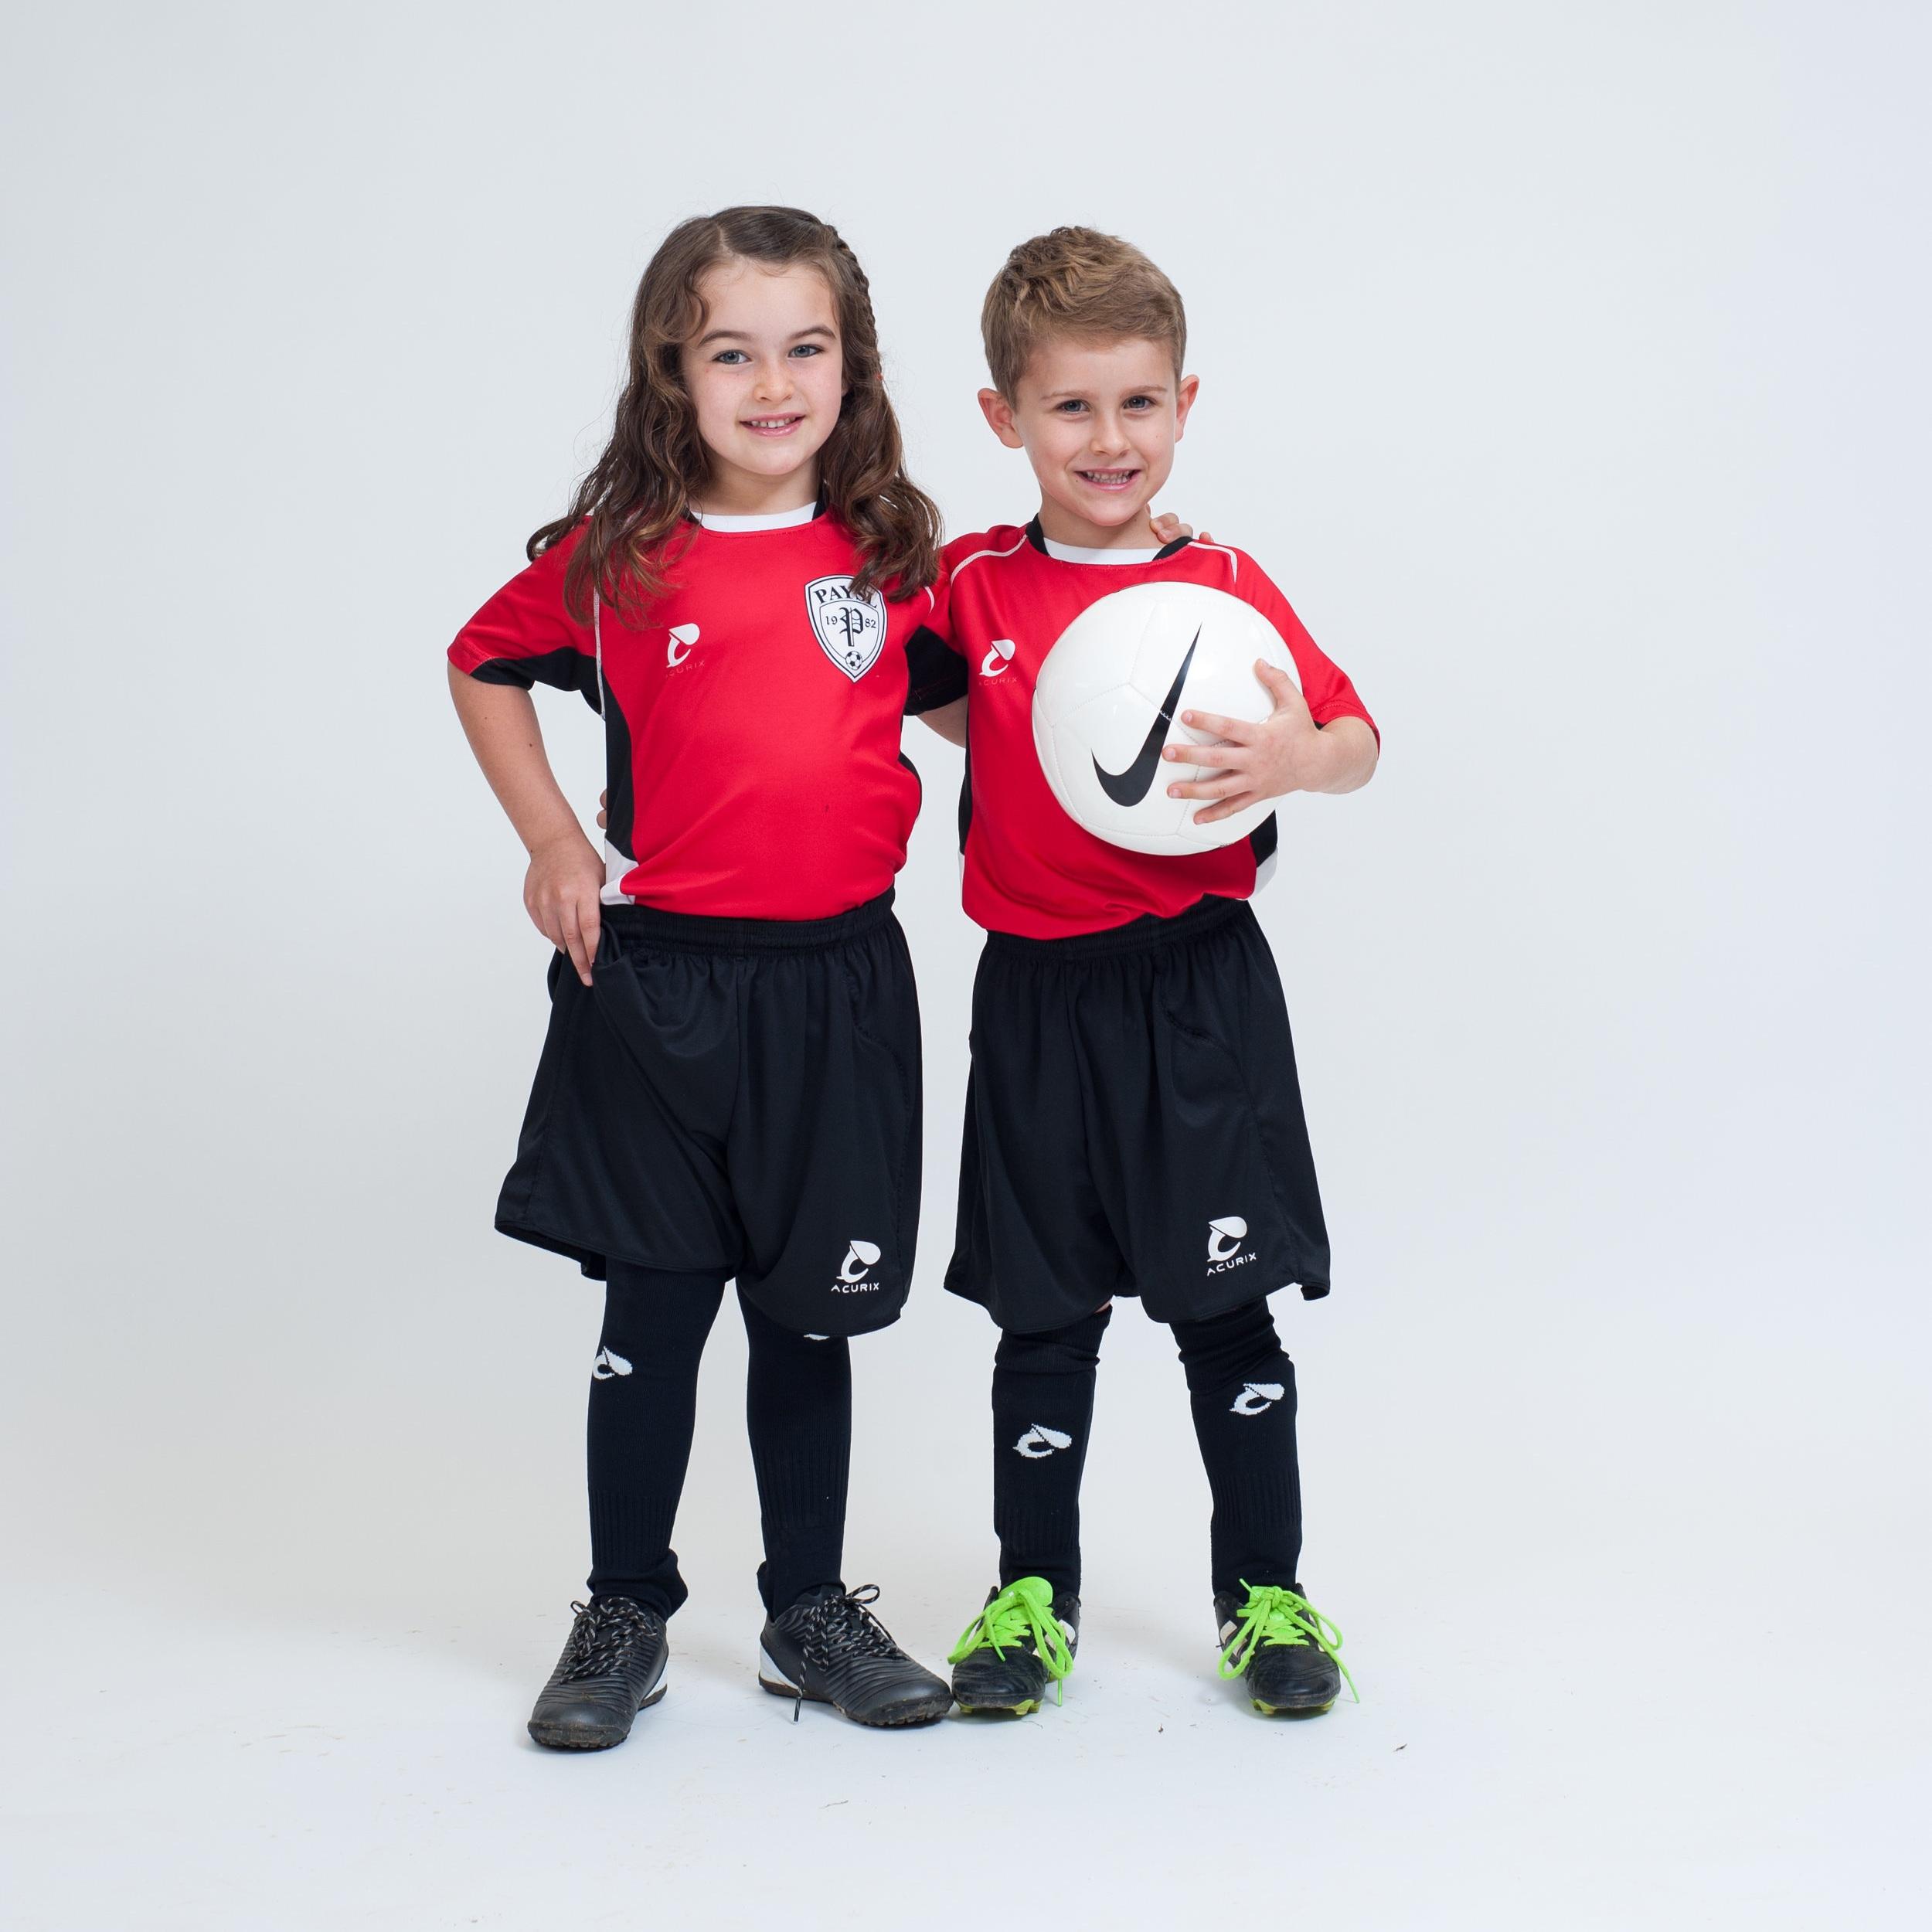 PAYSL Recreational Soccer: 4U–6U uniforms (colors vary)